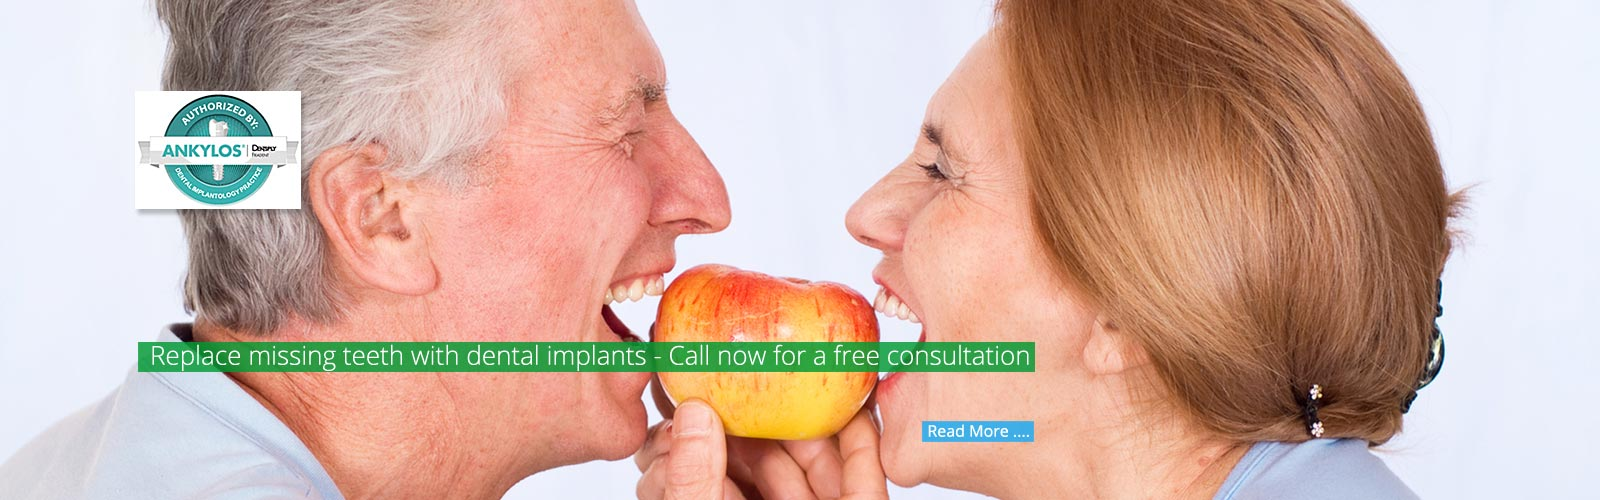 crossgar-dental-practice-dental-implants-1600×500-v13